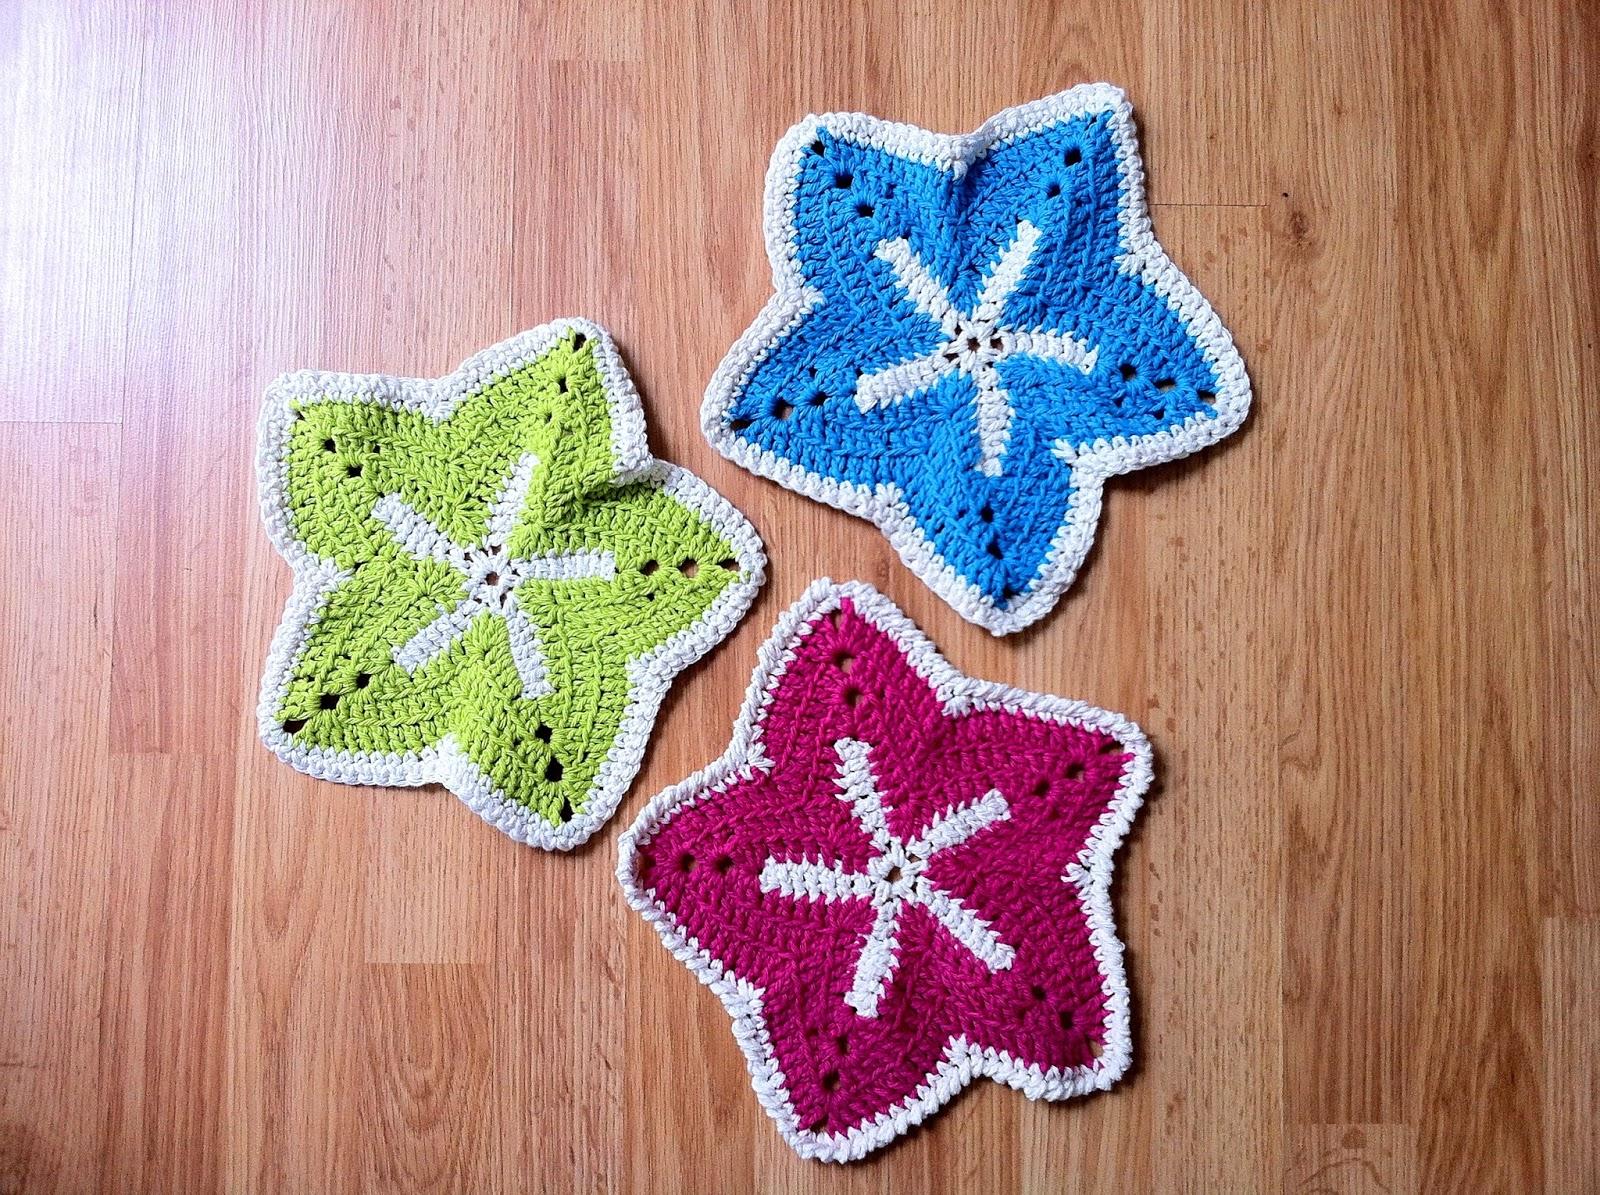 The Way I Crochet: Crochet Starfish Washcloth